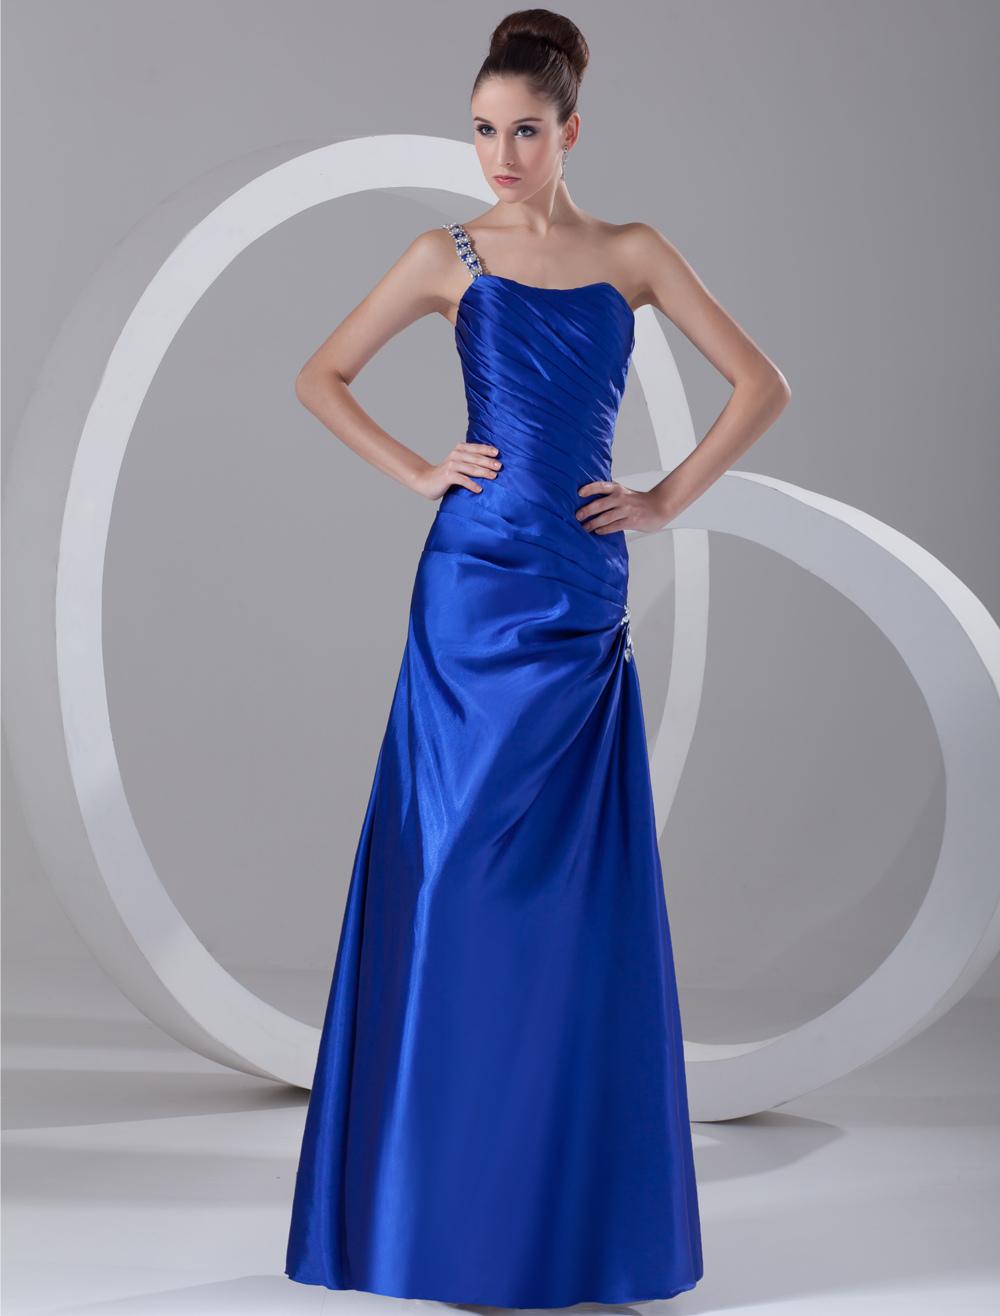 Chic Royal Blue Rhinestone One-Shoulder Women's Evening Dress (Wedding Evening Dresses) photo